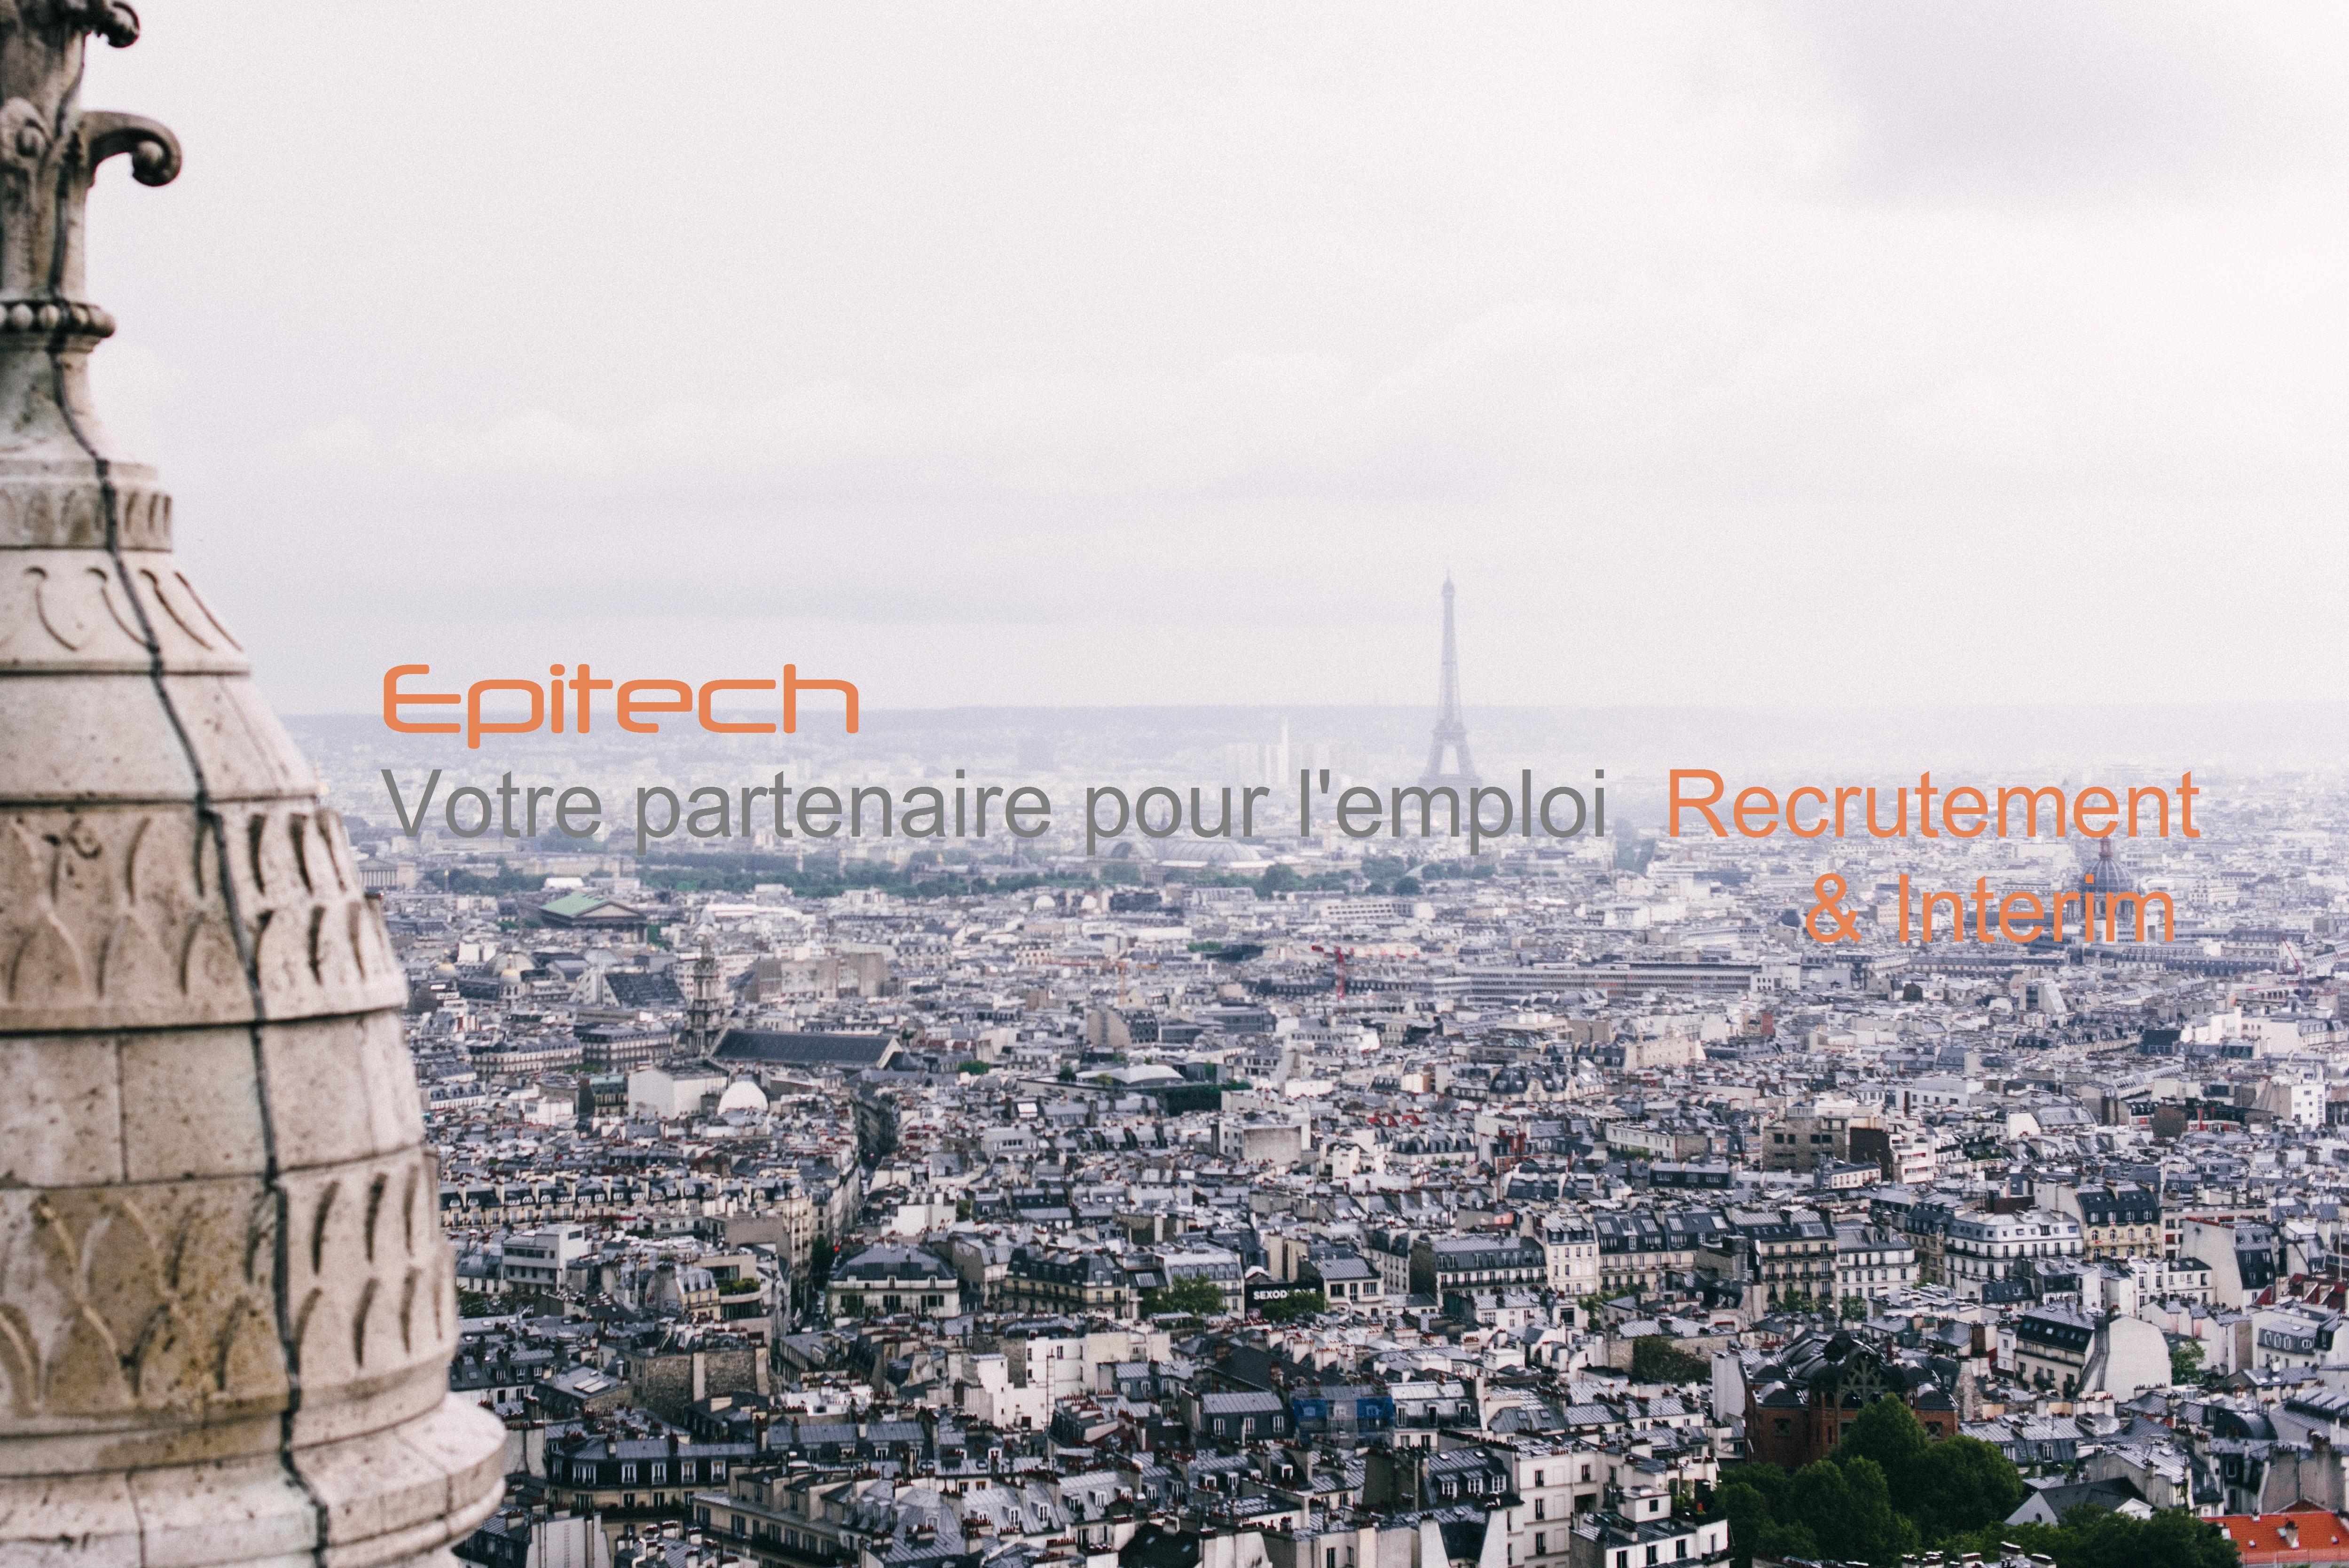 Emploi Dating banque assurance Lyon